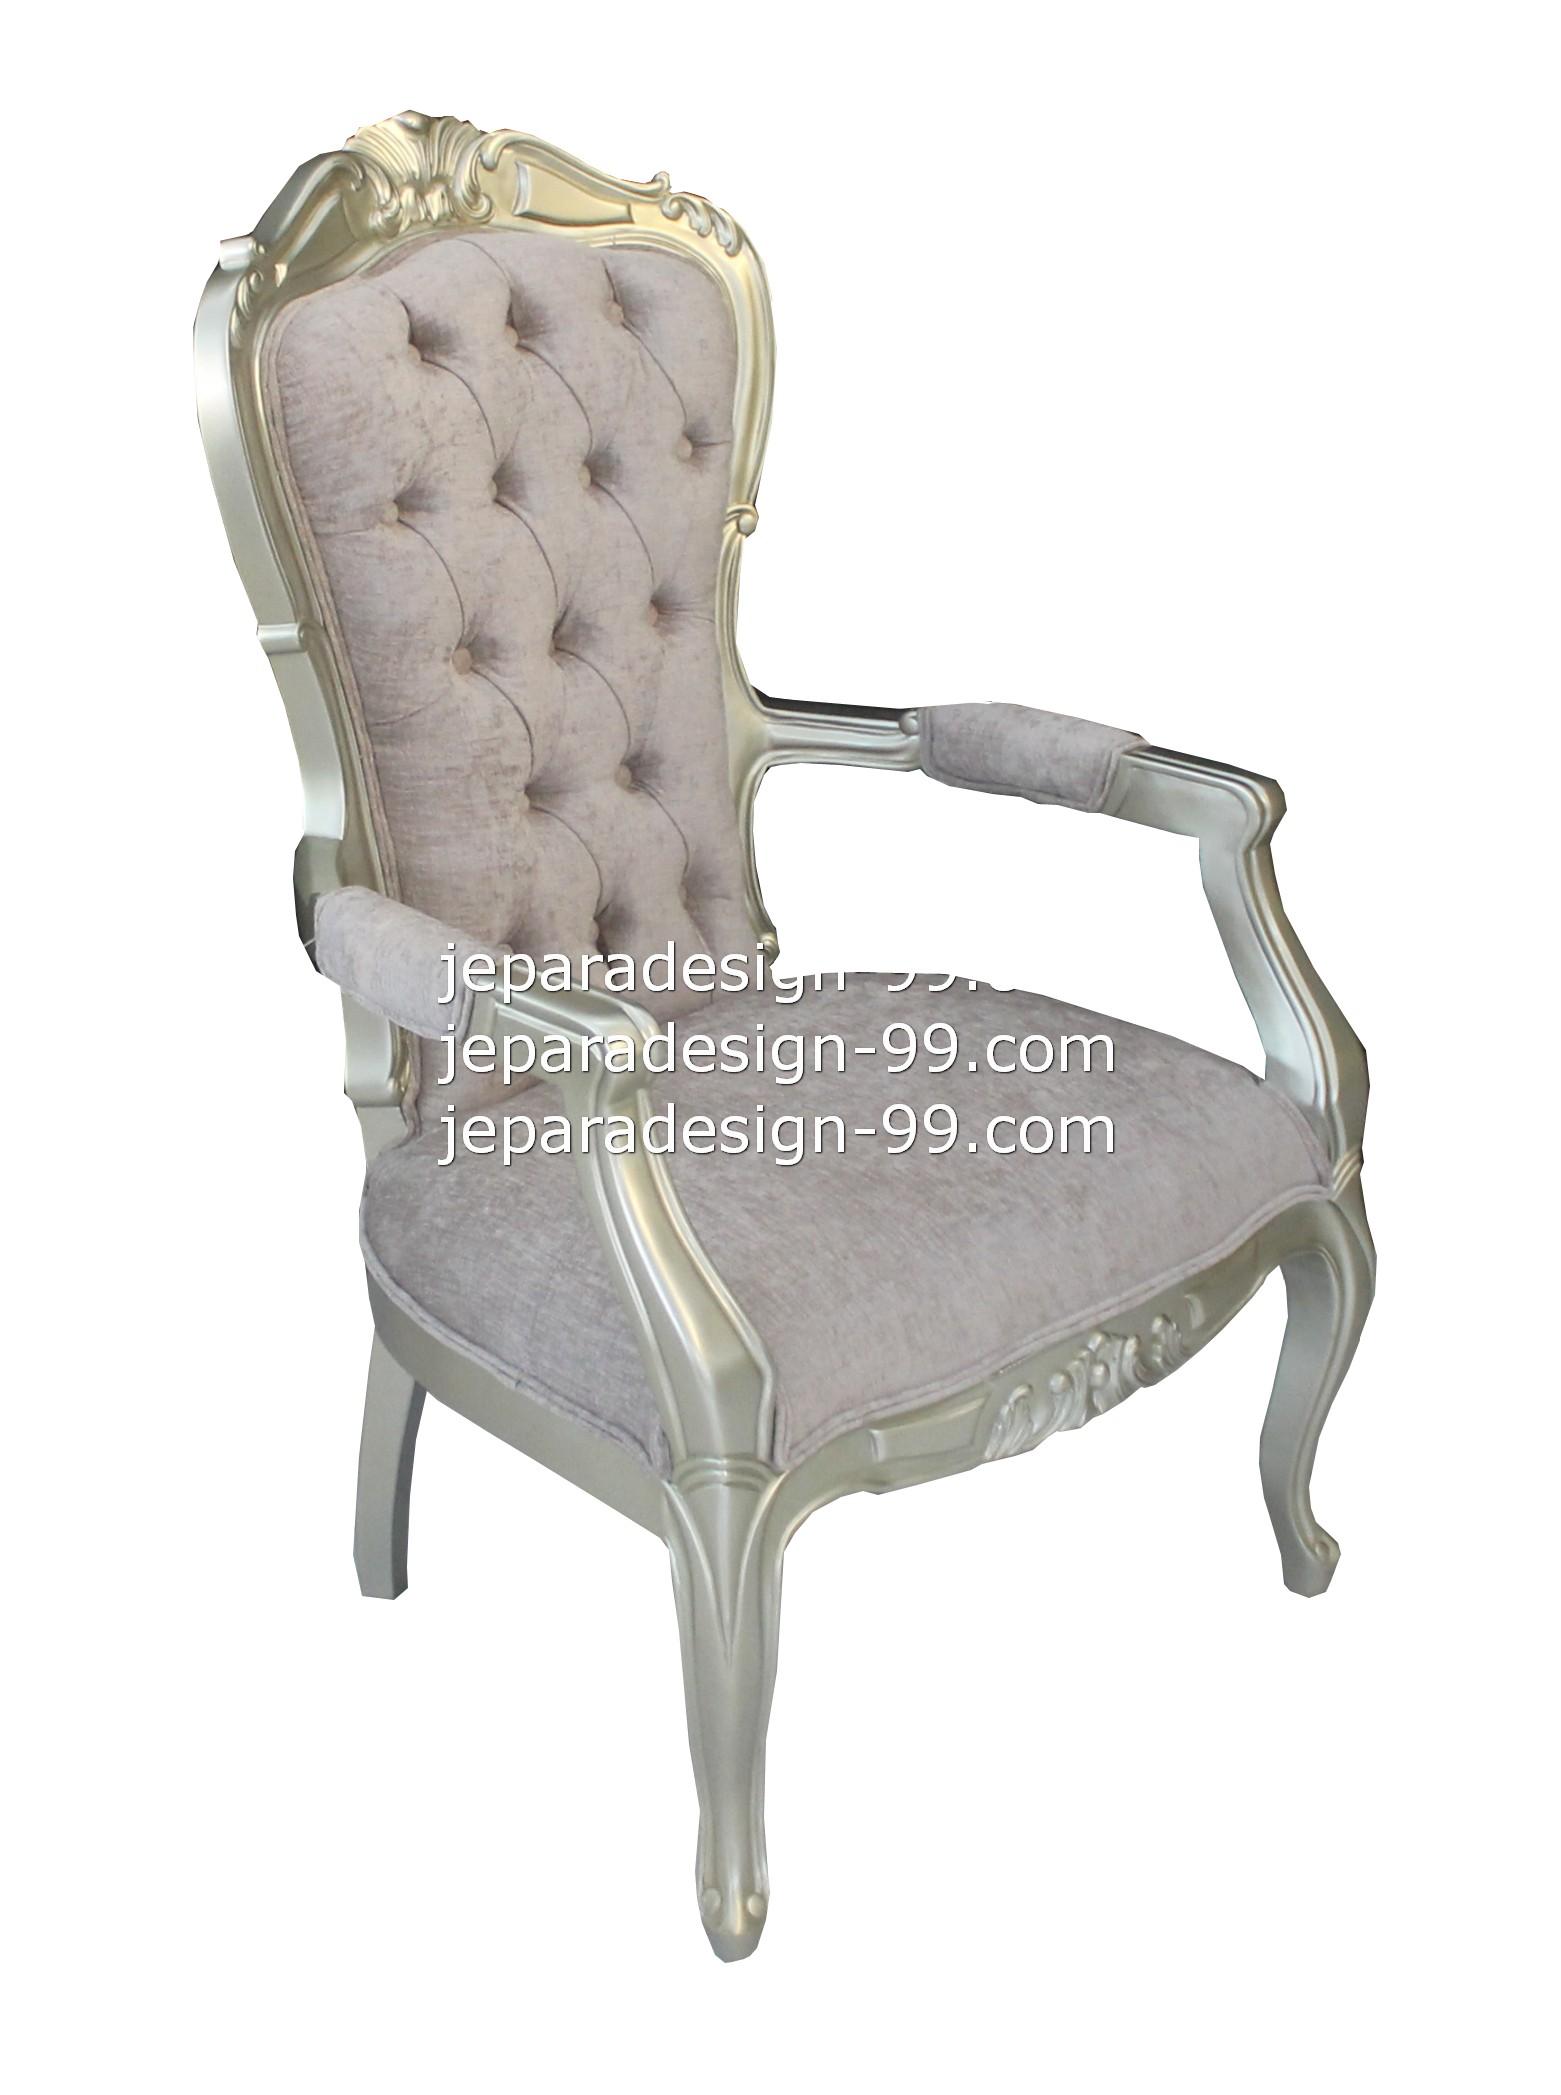 French Provincial Arm Chair ACH 061 CH